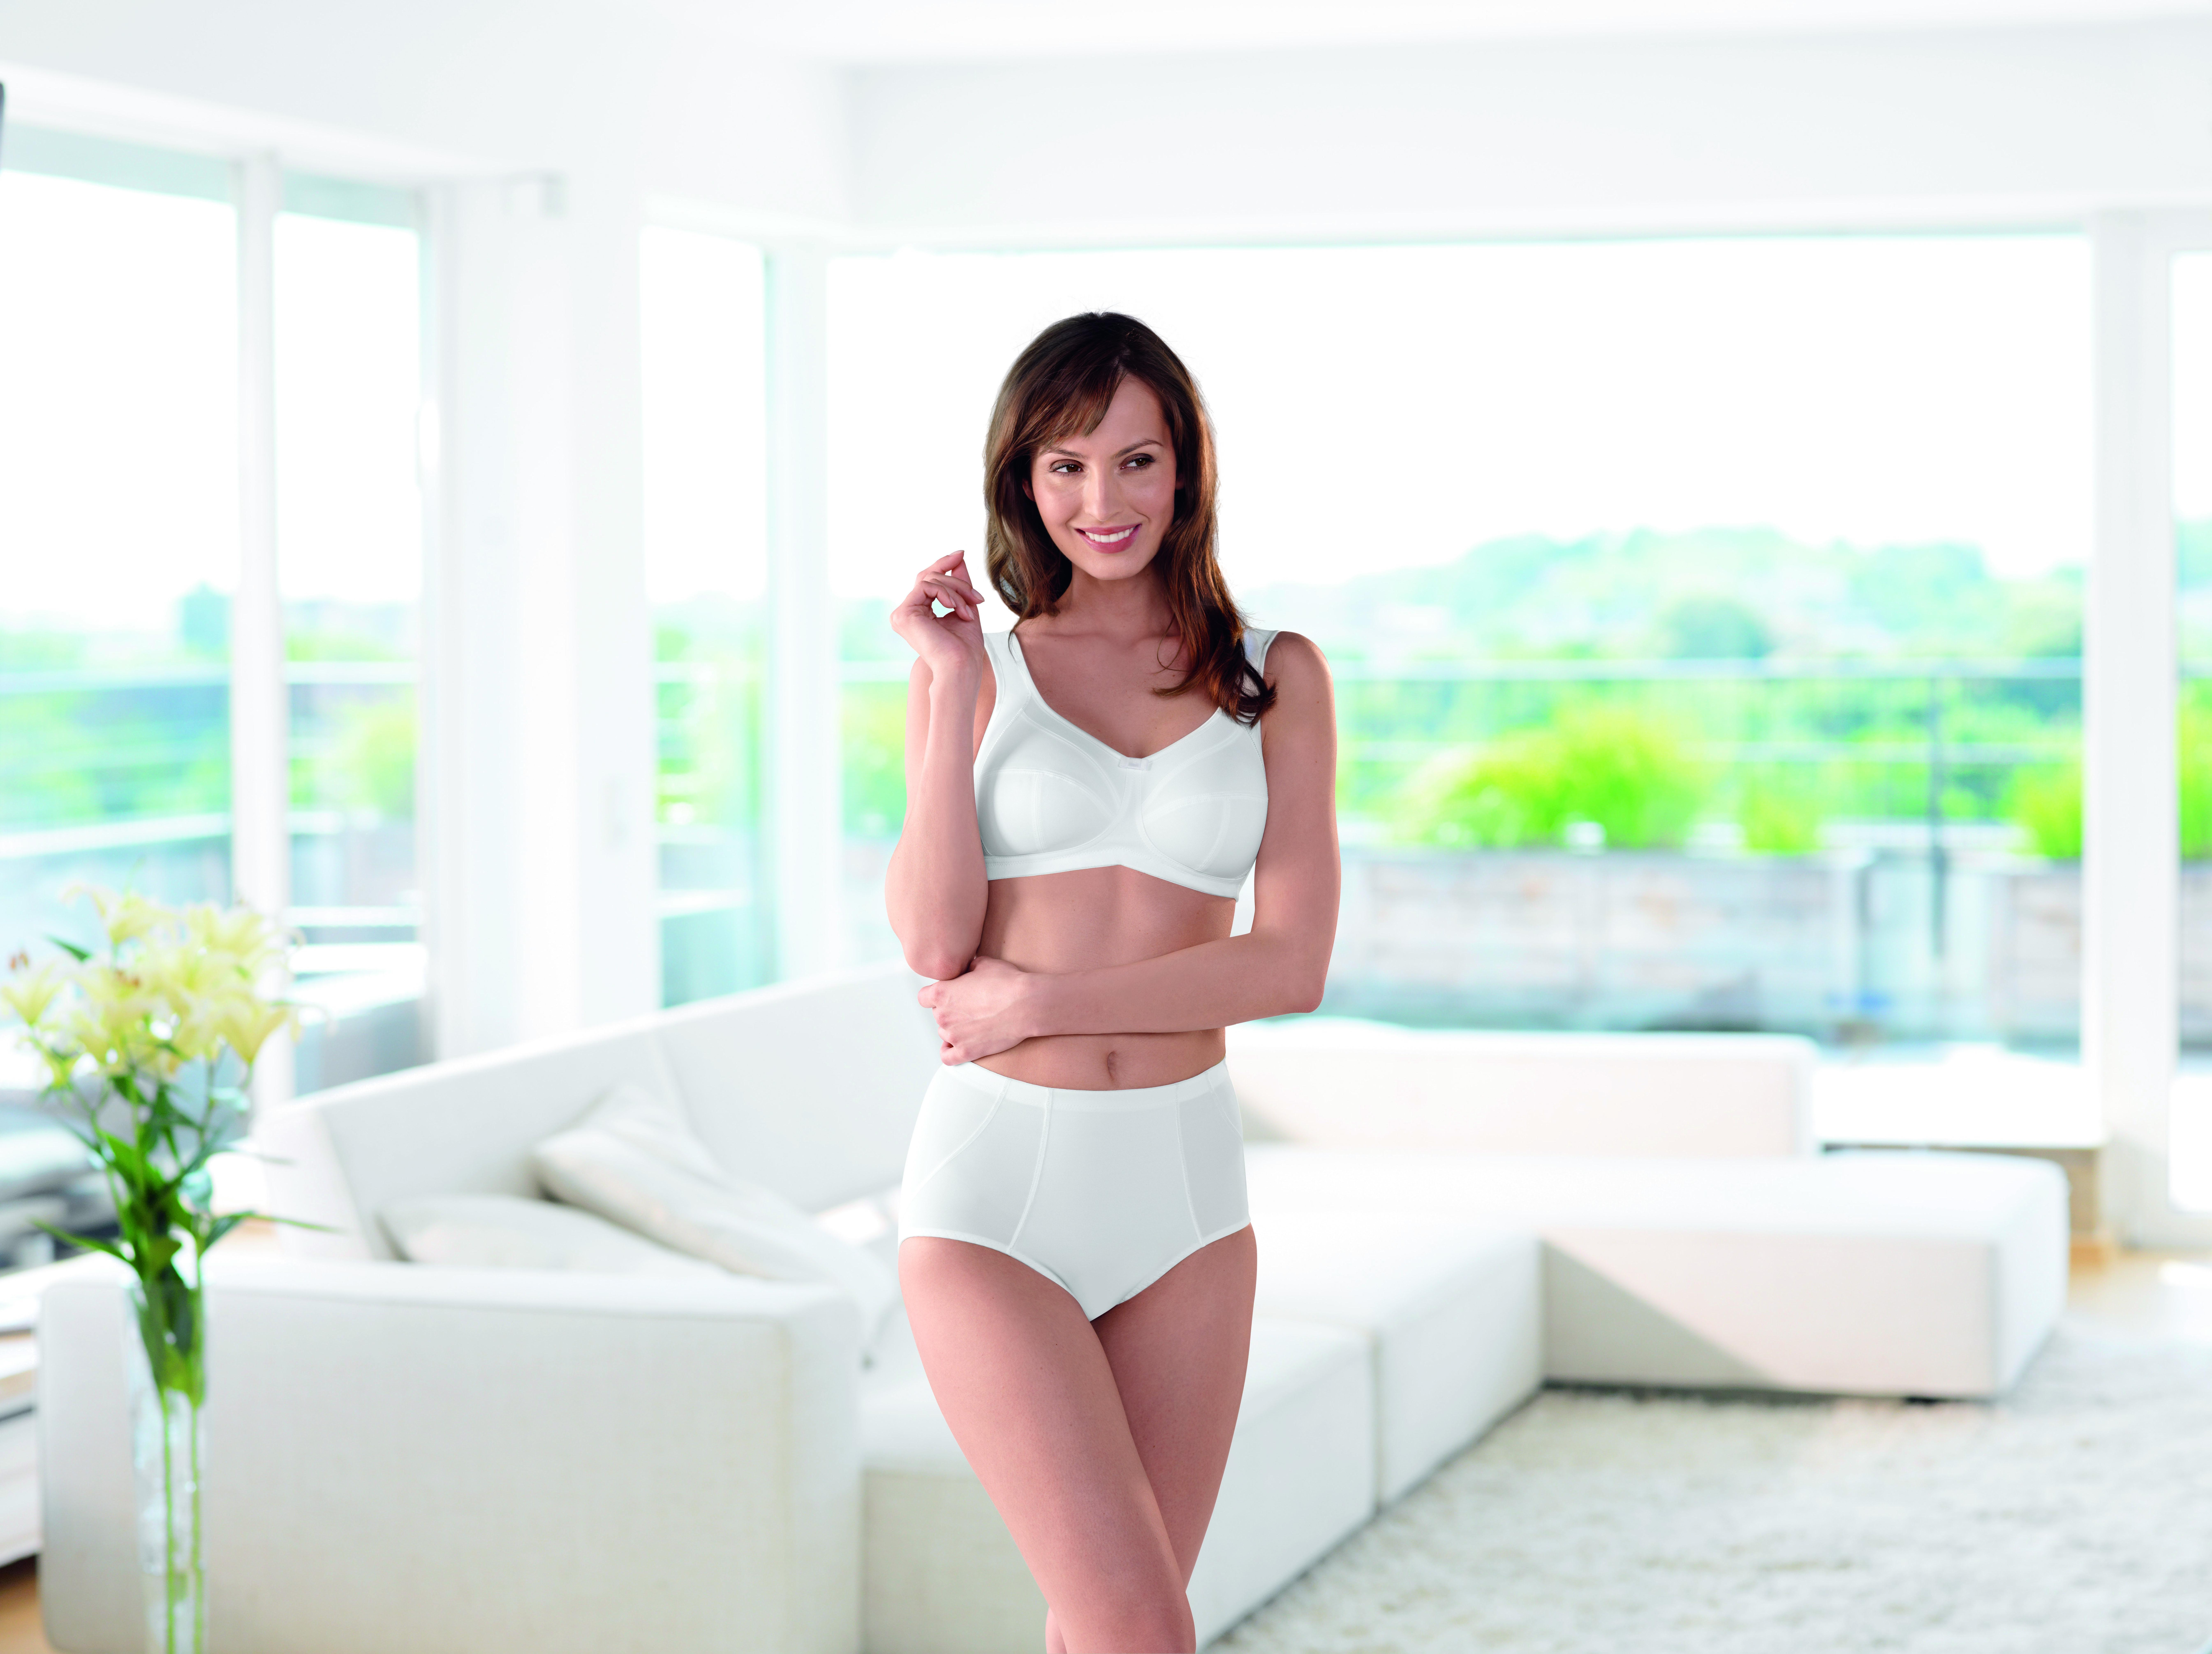 Soutien-gorge pr prothèse Clara - ANITA